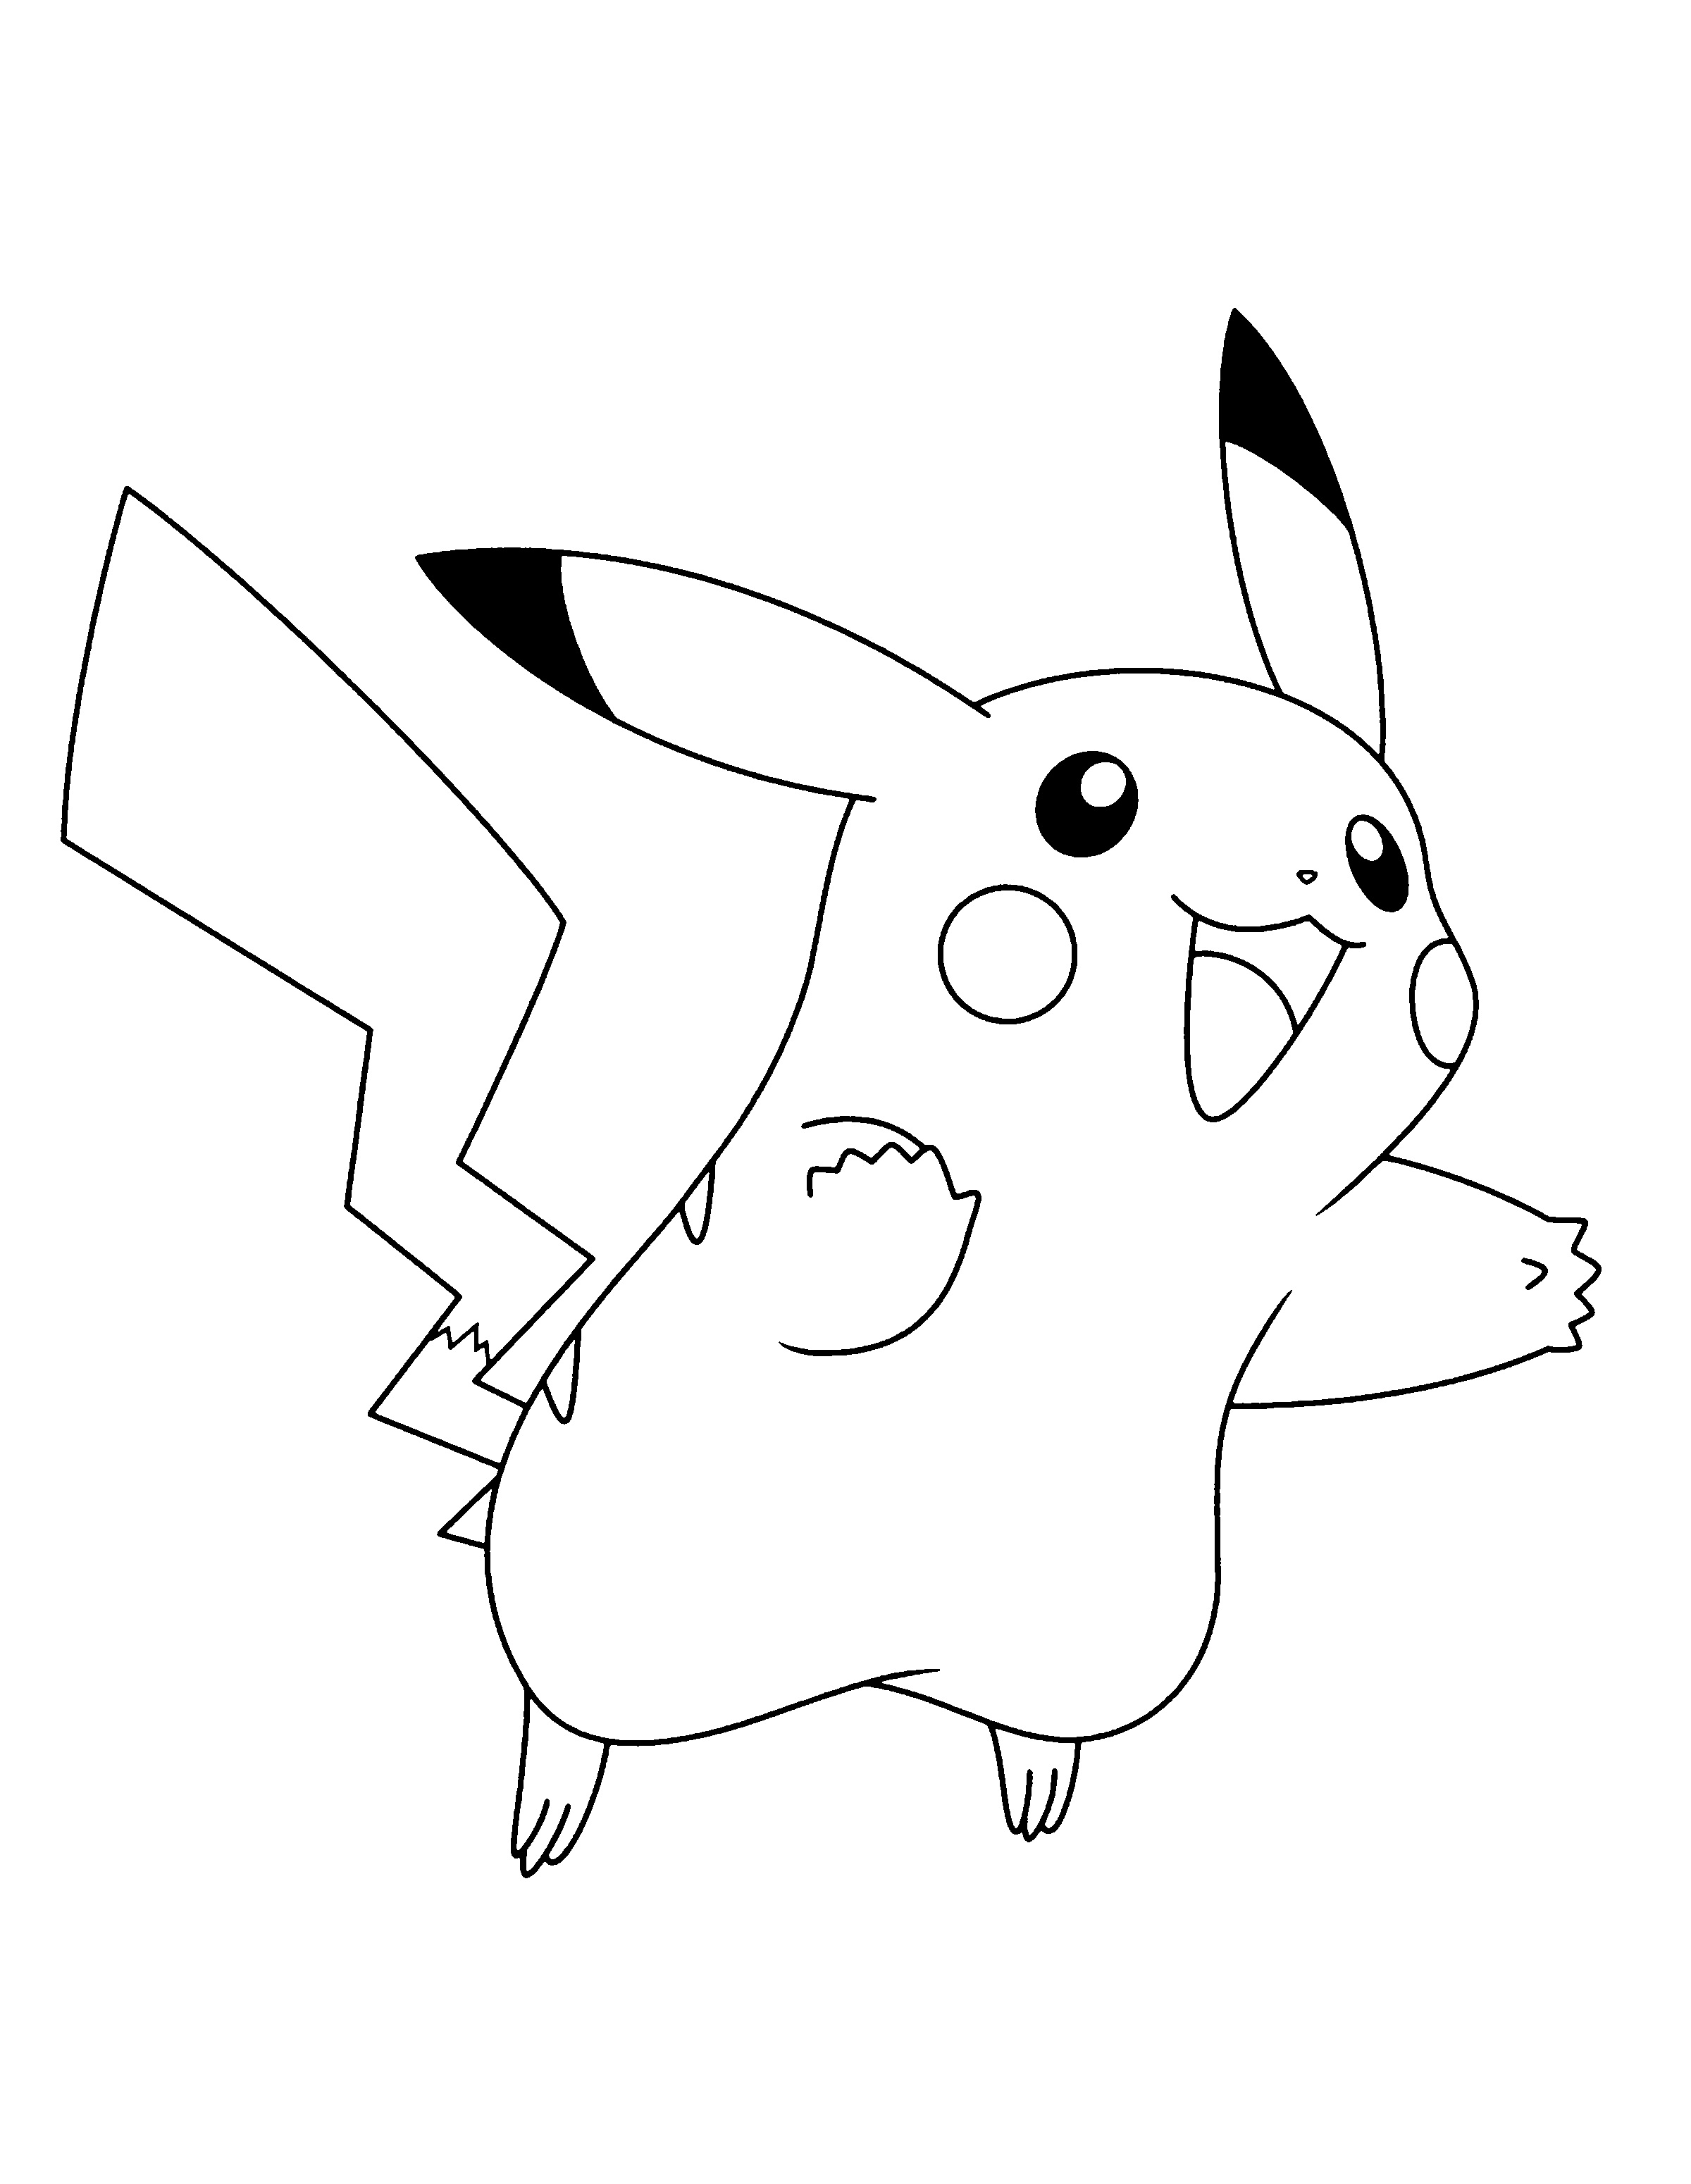 desenhos-para-colorir-do-pokemon-27